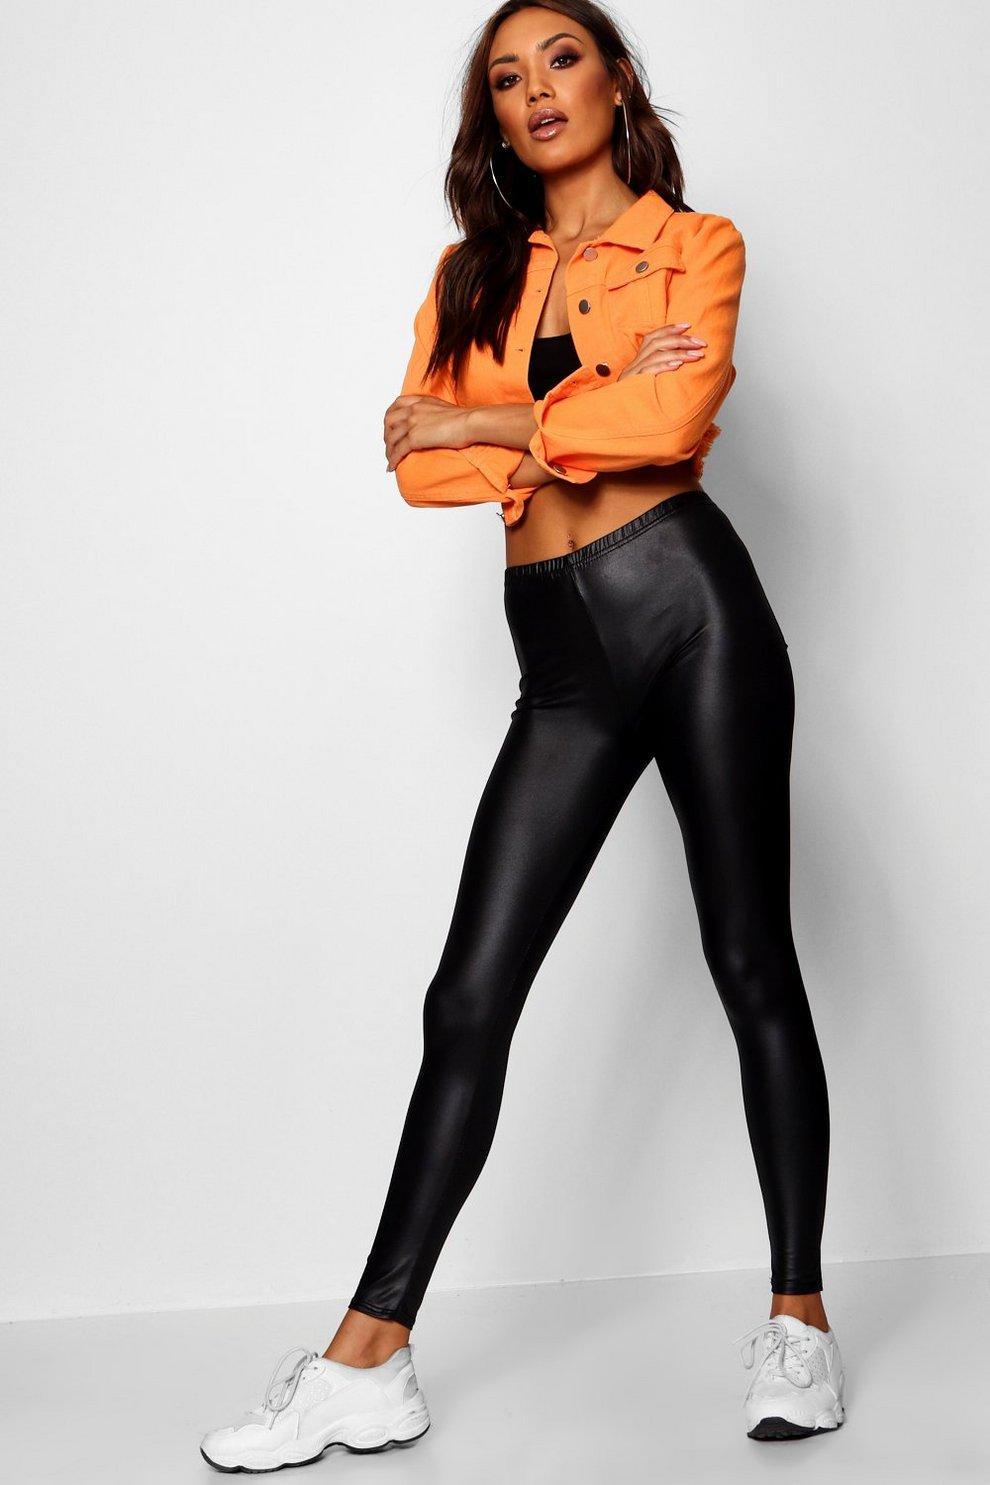 Boohoo Neri Sportivi Scritta Leggings Con Woman Y67bgfy